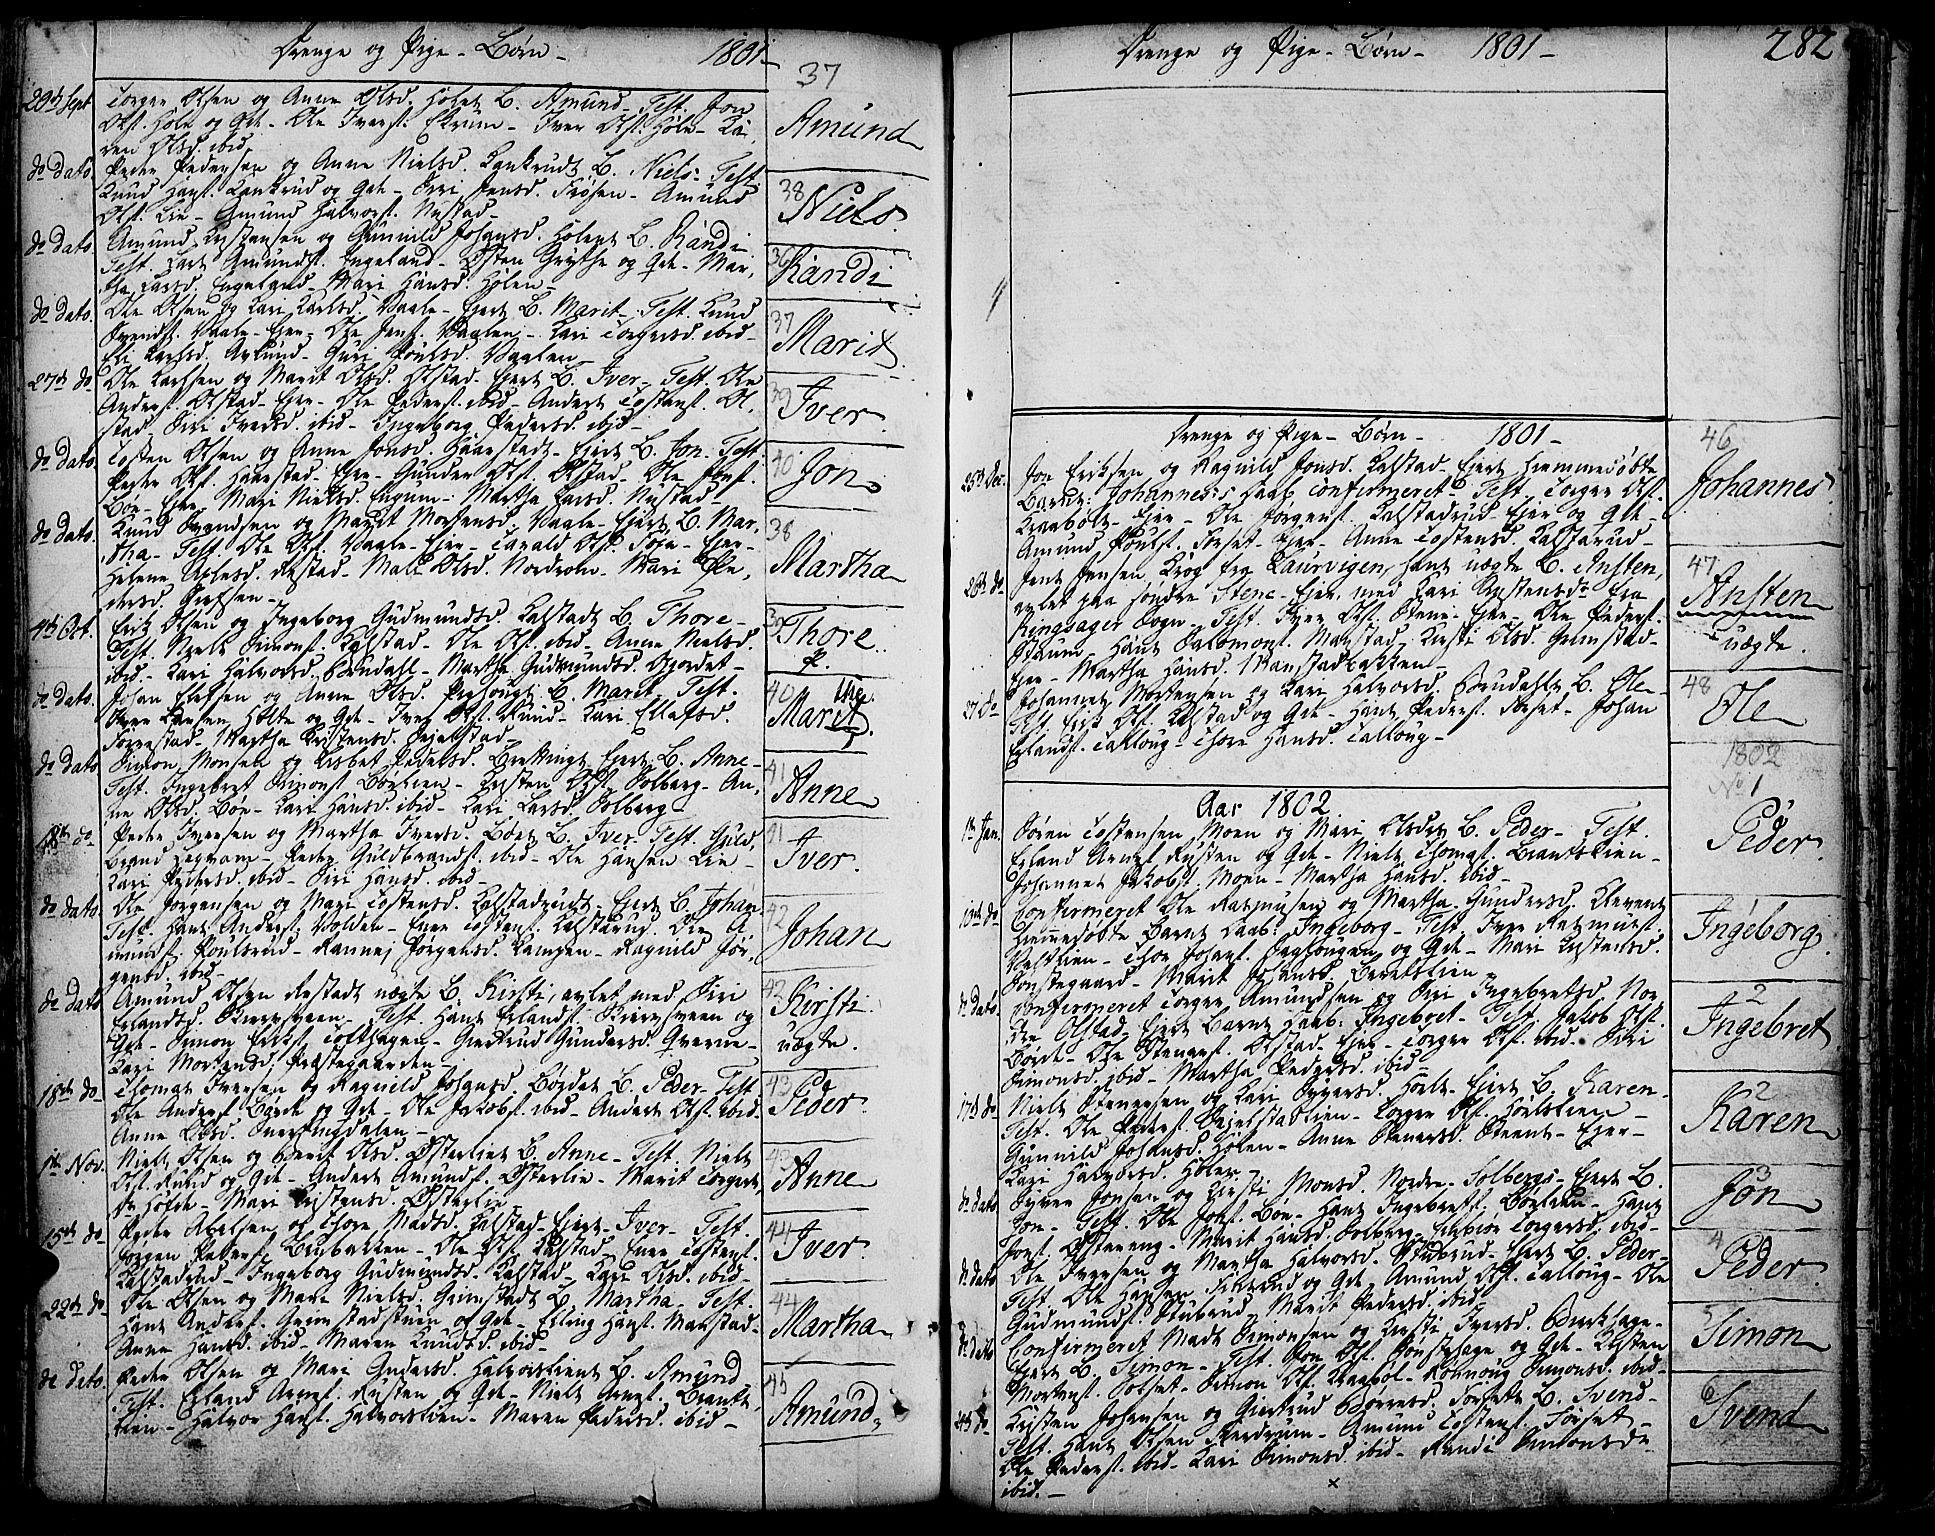 SAH, Gausdal prestekontor, Ministerialbok nr. 3, 1758-1809, s. 282